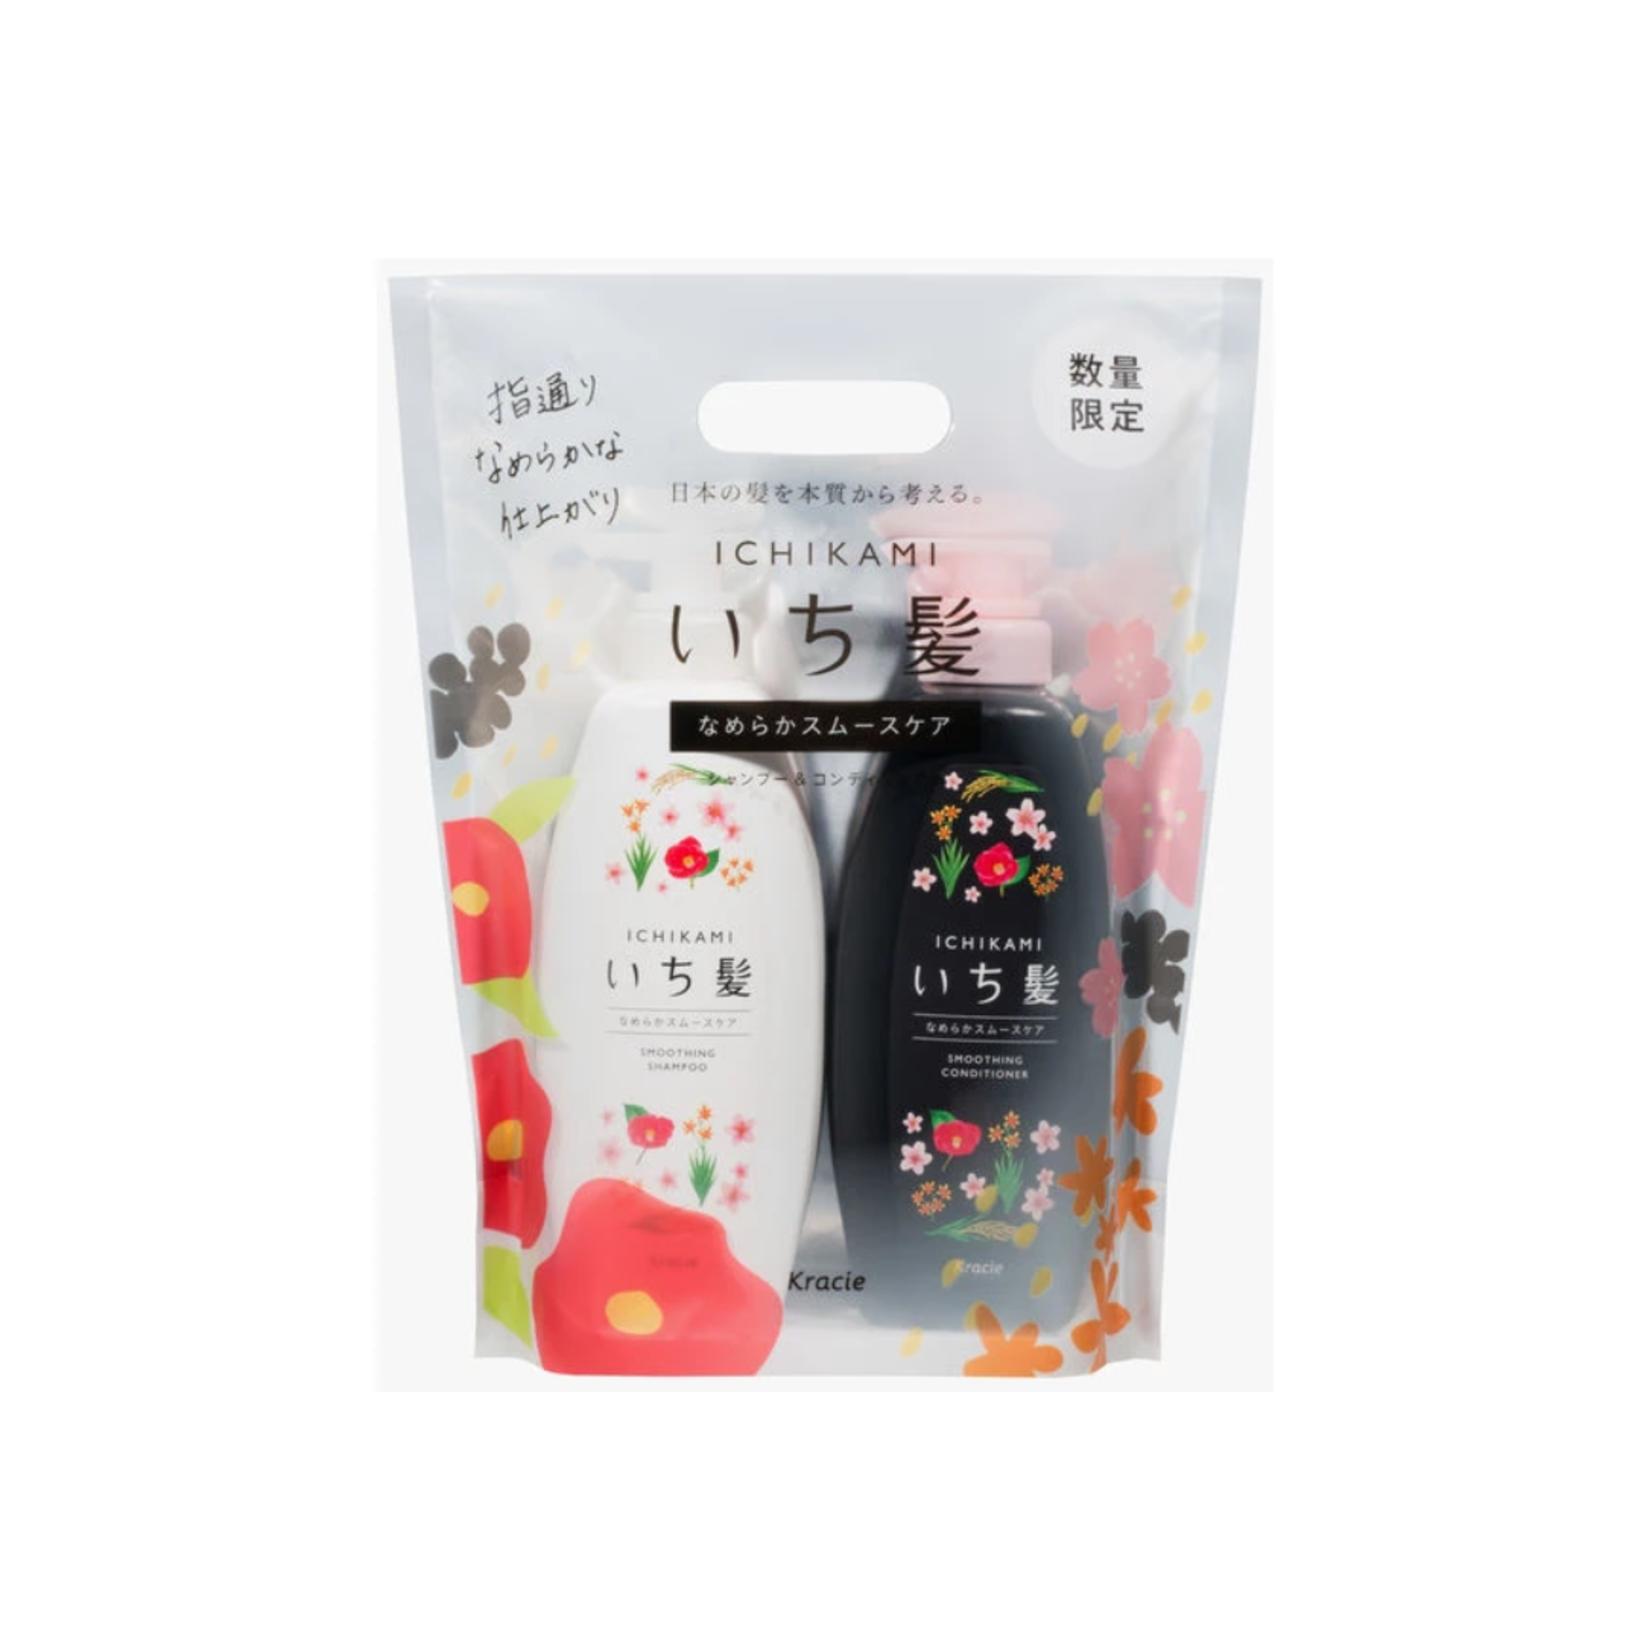 Kracie Kracie Ichikami Shampoo & Conditioner Pair Set